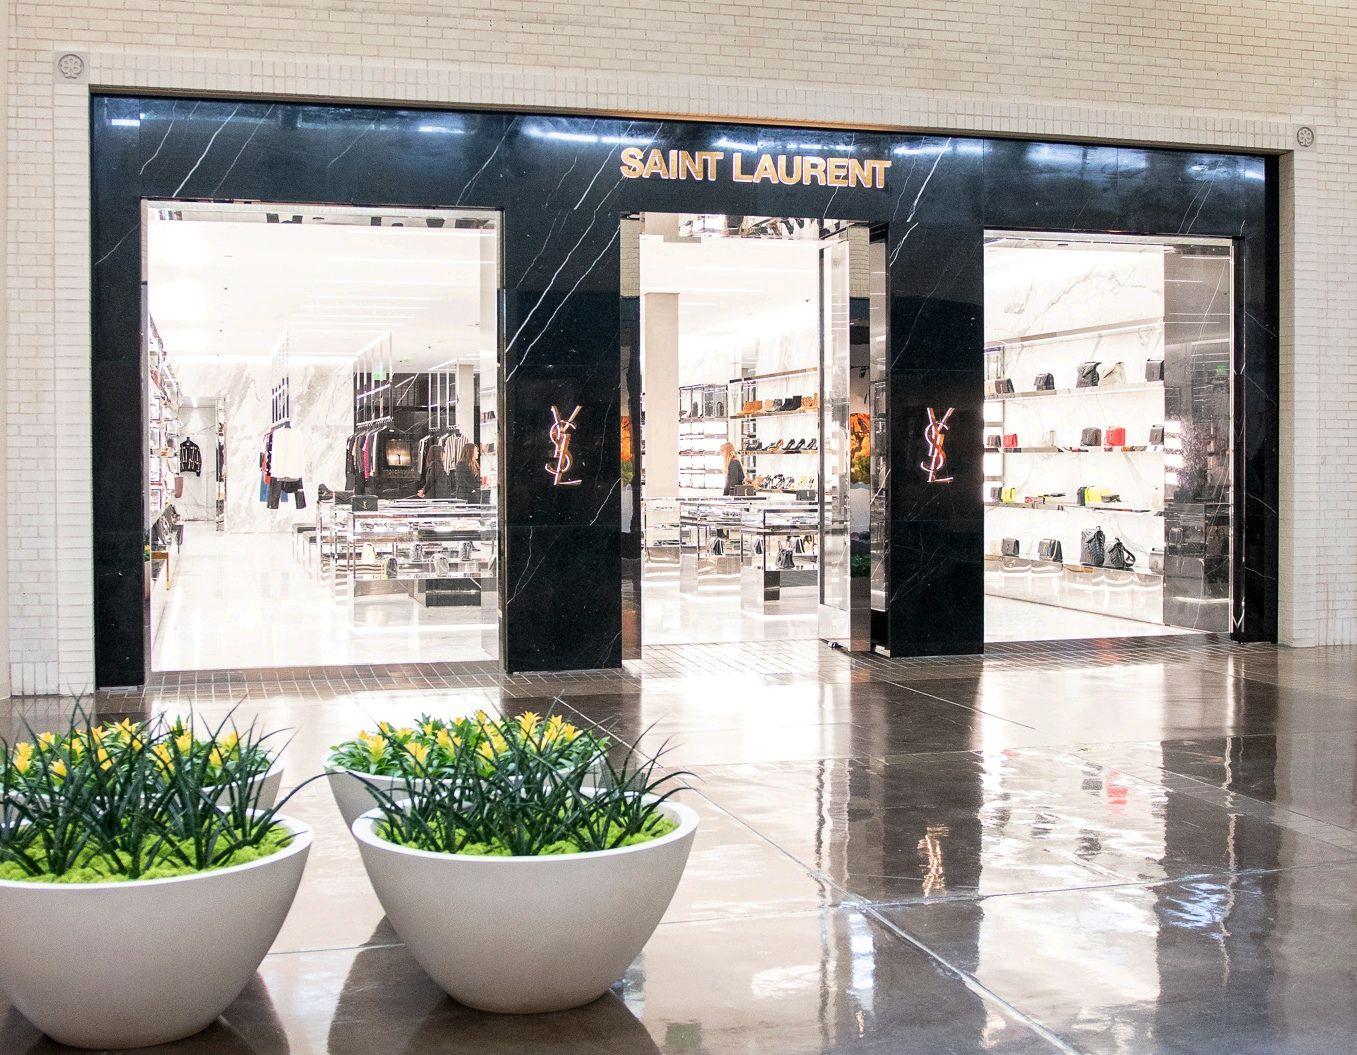 Saint Laurent opened in June 2019 at NorthPark Center in Dallas.